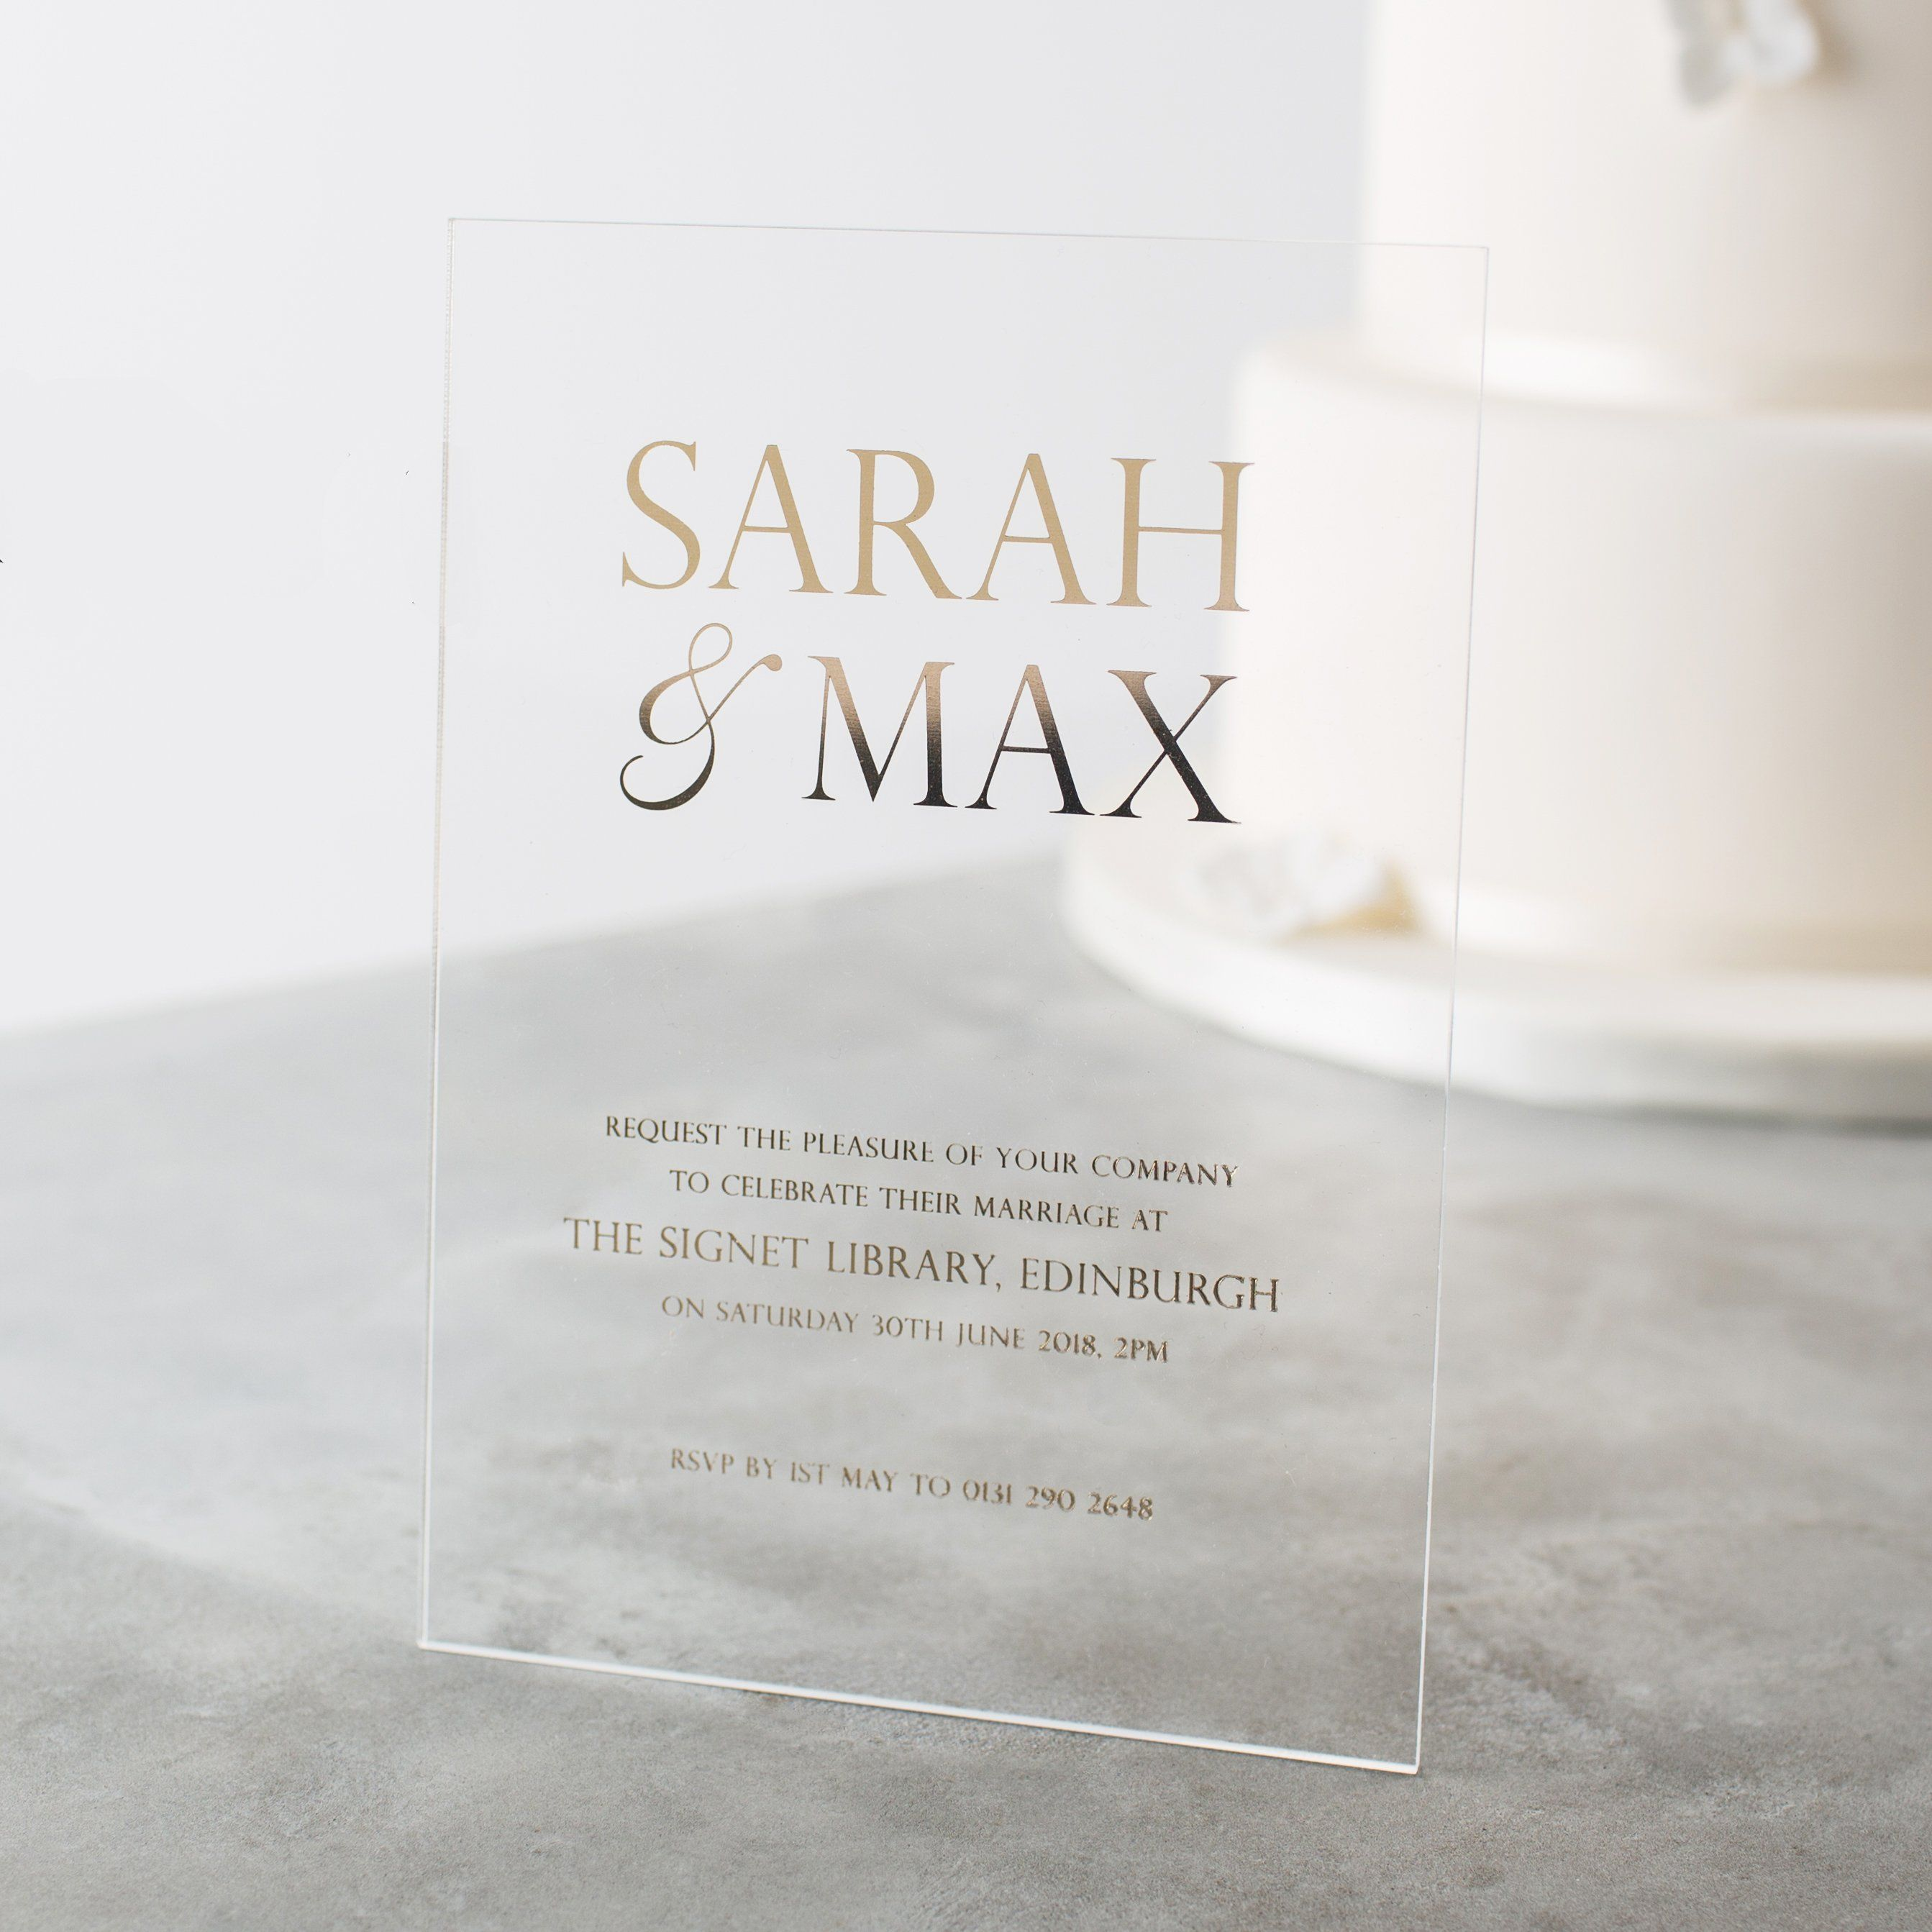 Personalised Acrylic Foiled Wedding Invitations | Wedding Ideas ...